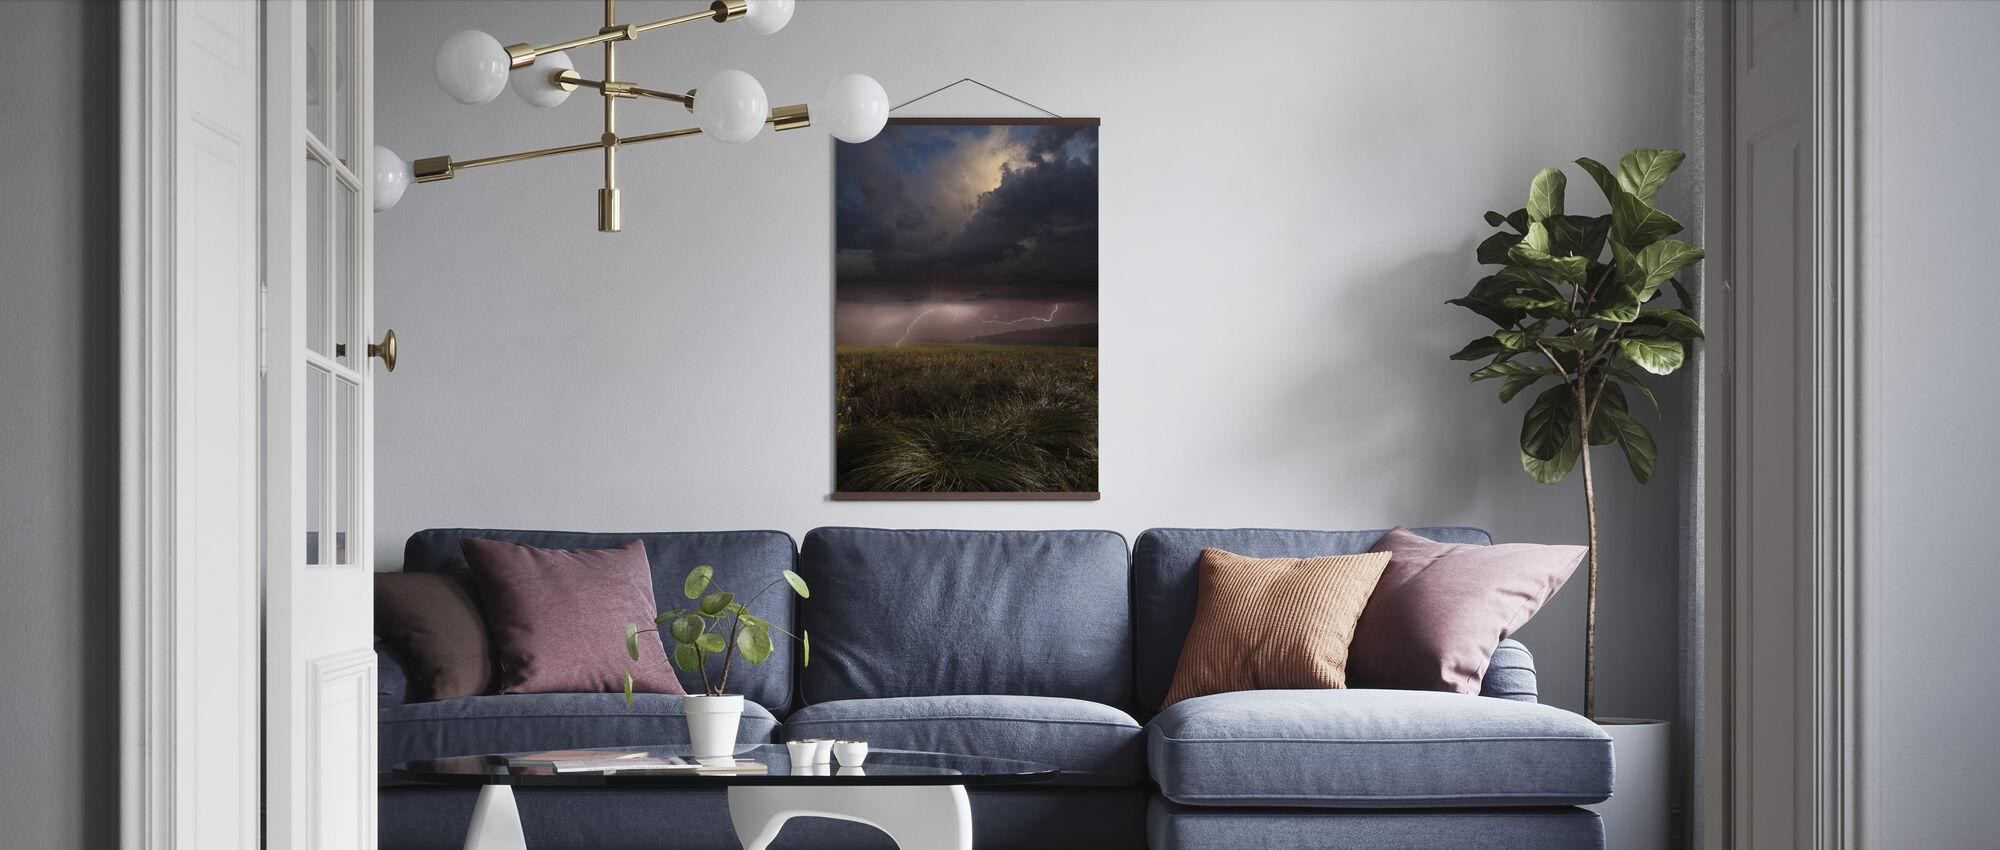 Rosa Lyn - Plakat - Stue